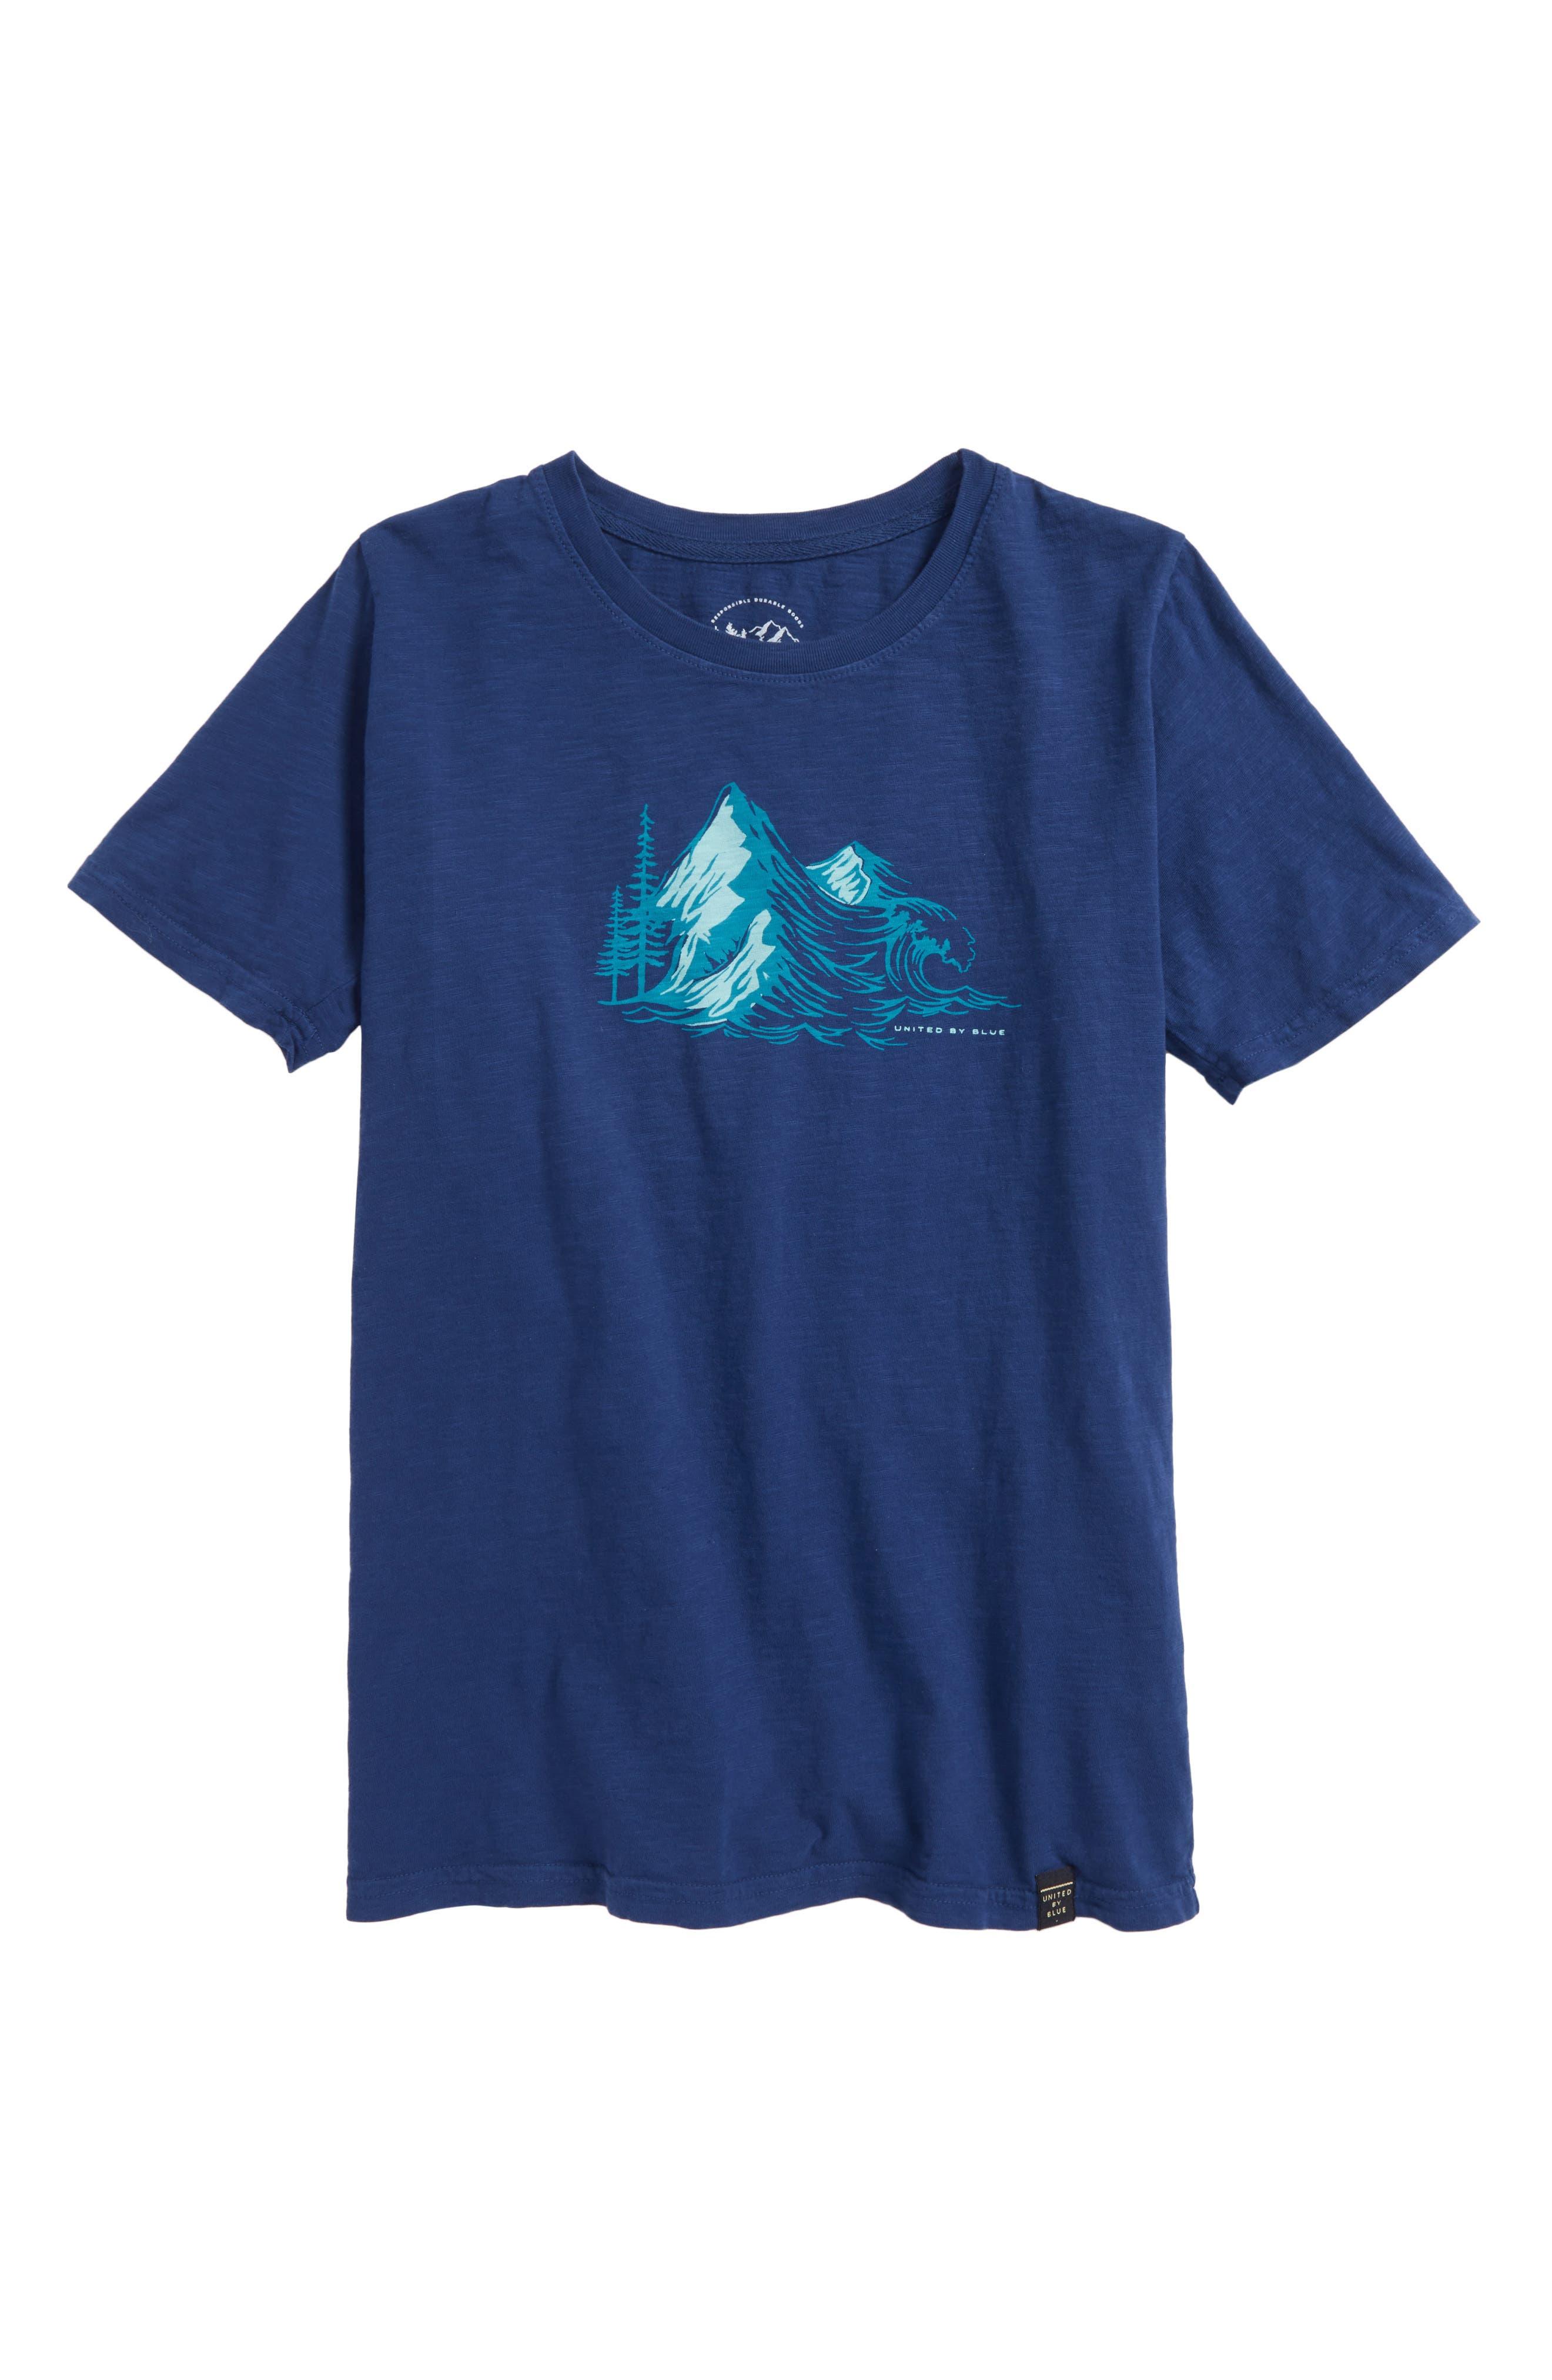 United By Blue Peaks Graphic Organic Cotton T-Shirt (Little Boys & Big Boys)